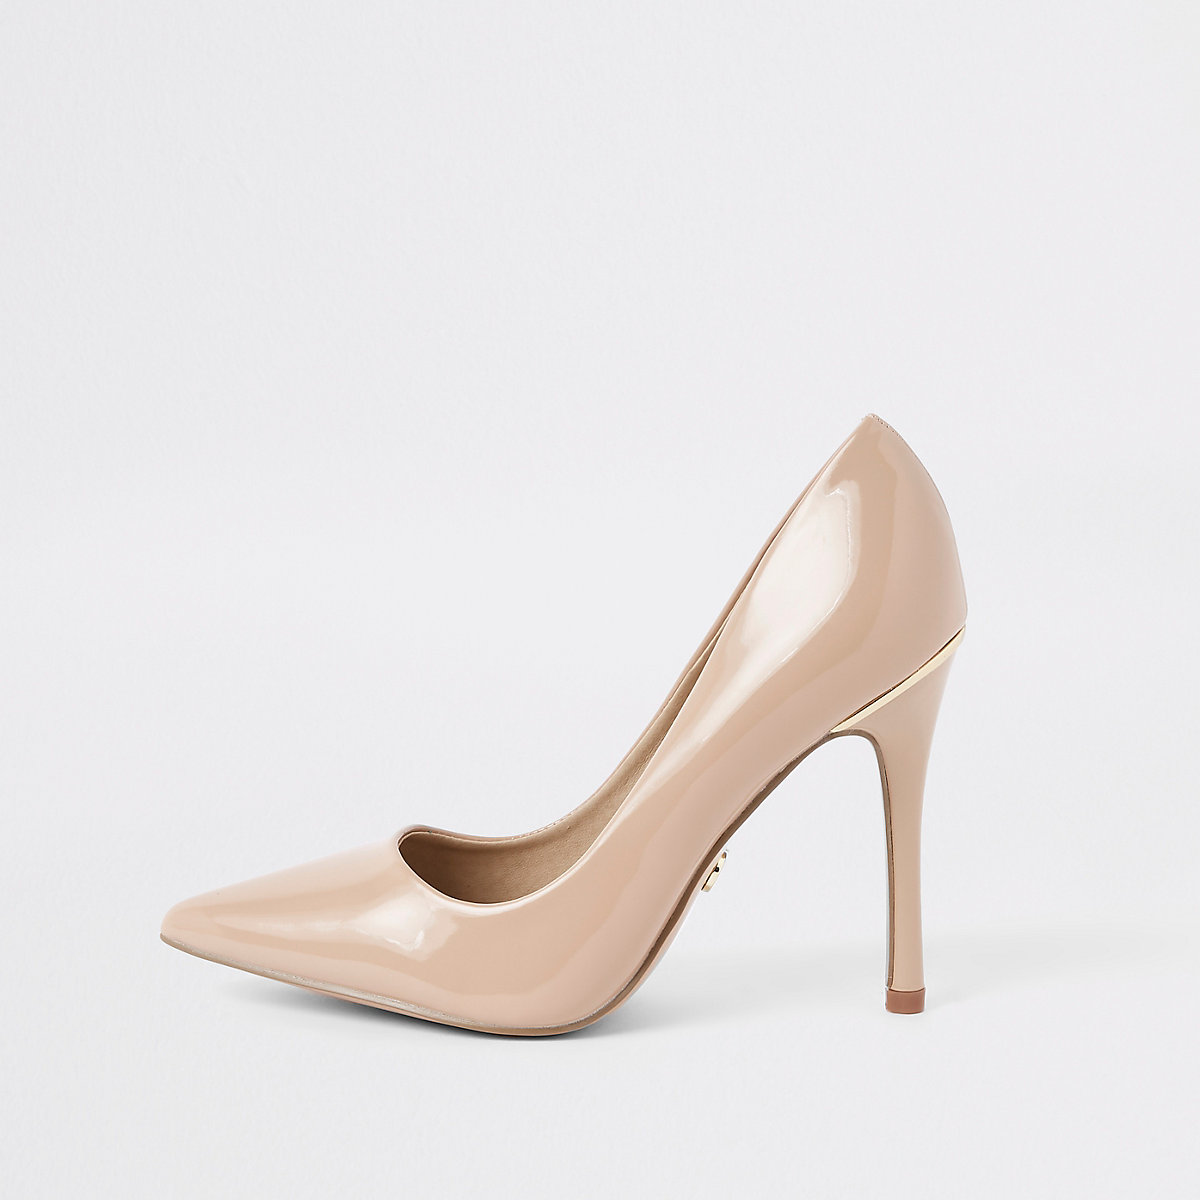 165b591f004b1 Escarpins rose sable vernis - Chaussures - Chaussures   Bottes - Femme